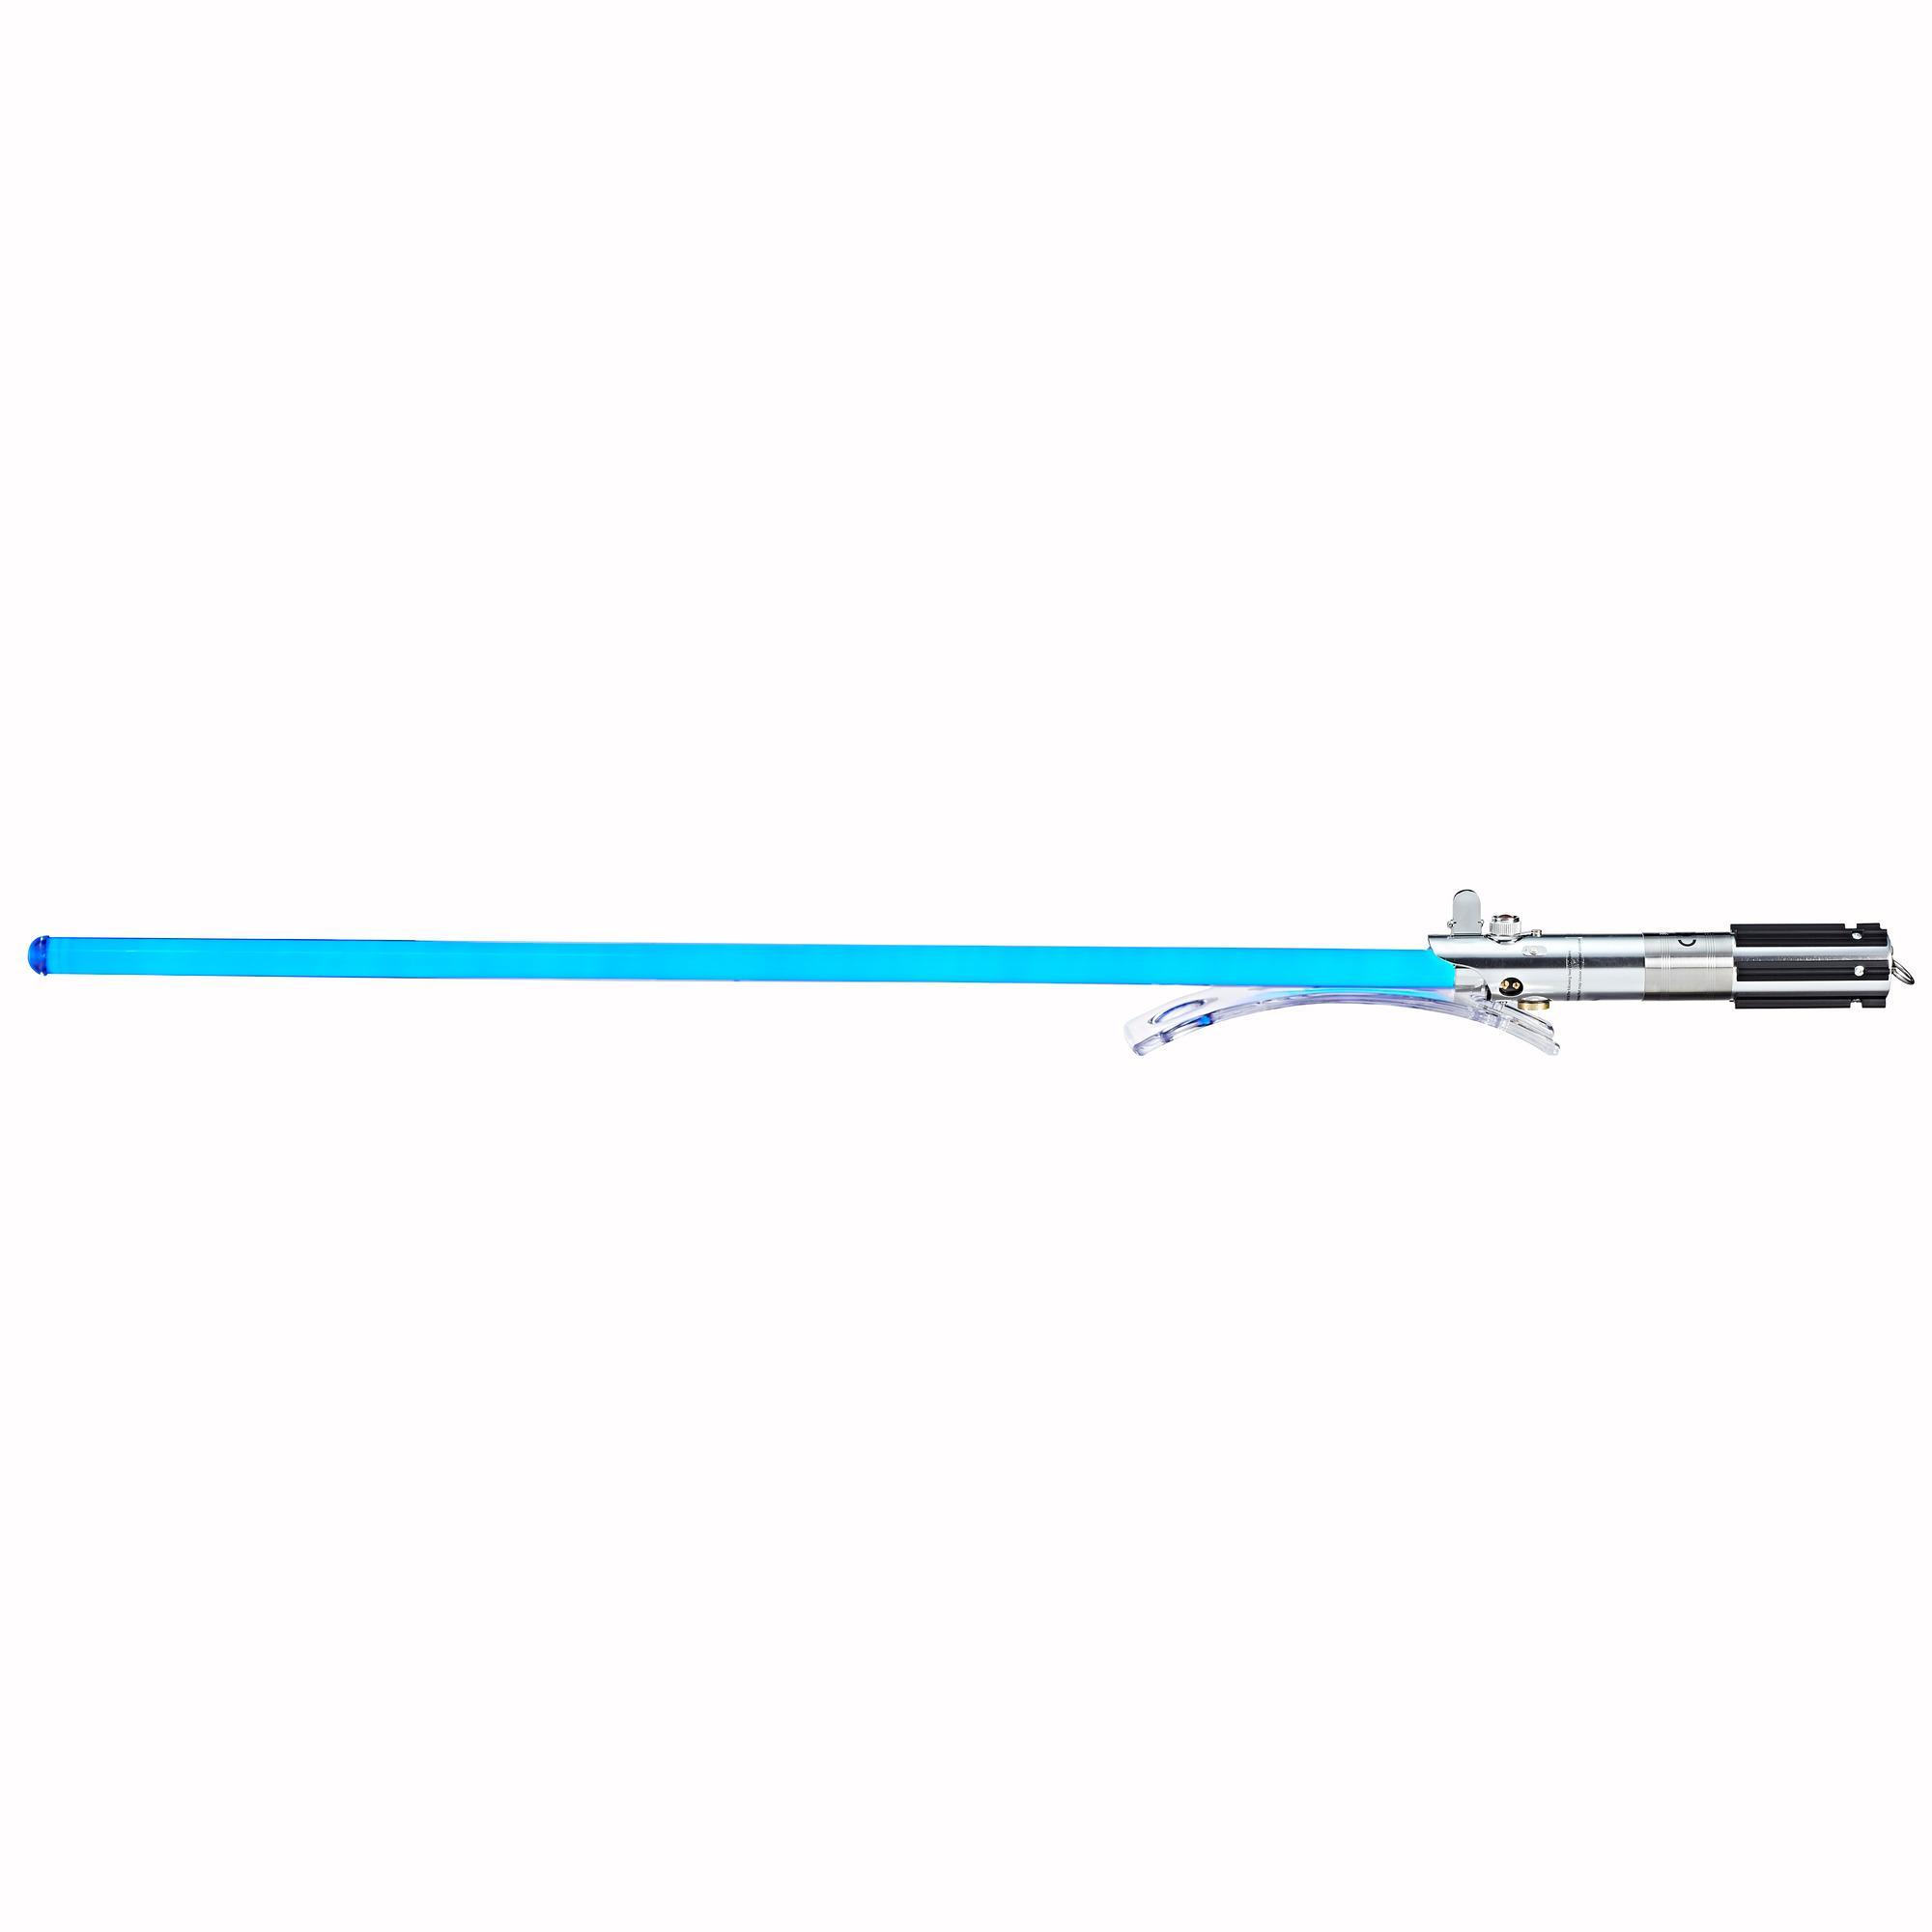 Star Wars: The Last Jedi The Black Series Rey (Jedi Training) Force FX Lightsaber